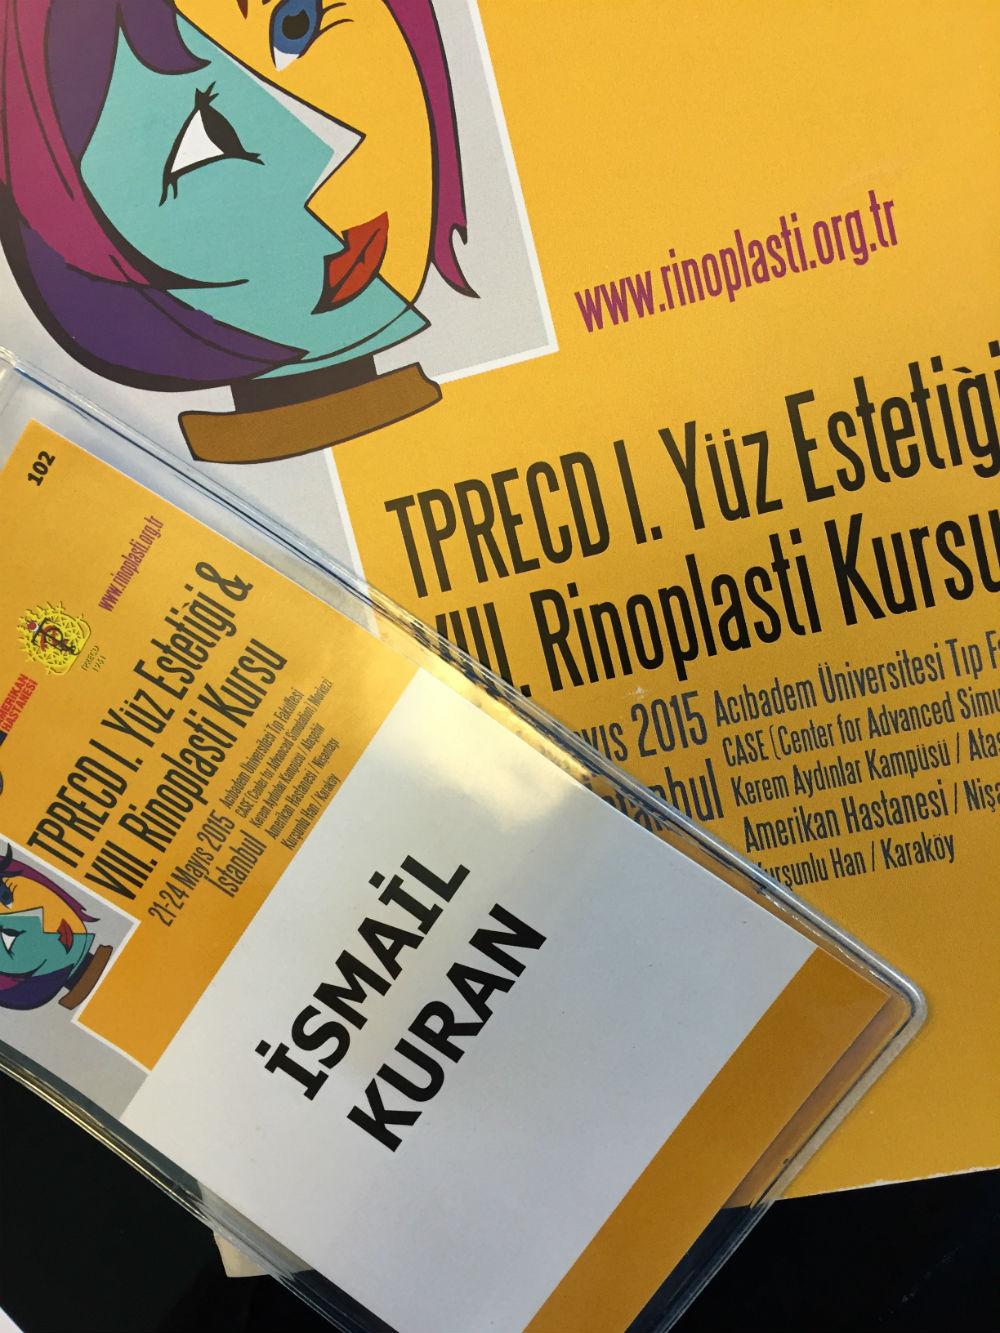 istanbul-8-rinoplasti-kursu